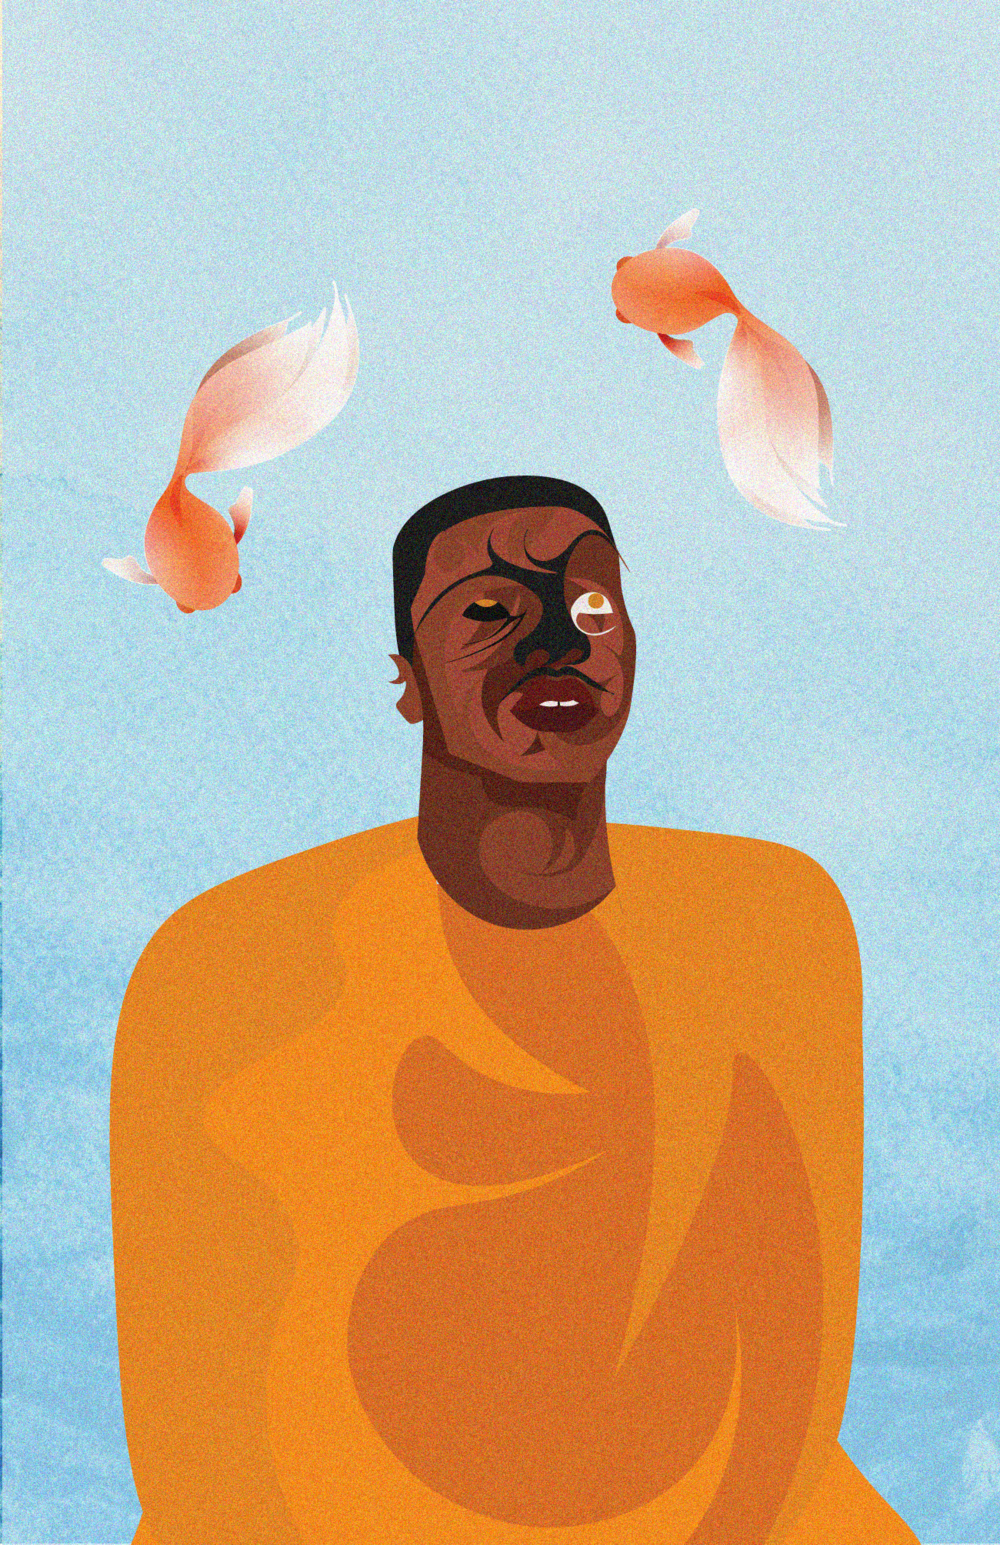 Vince  by Hamda Warsame (2018)